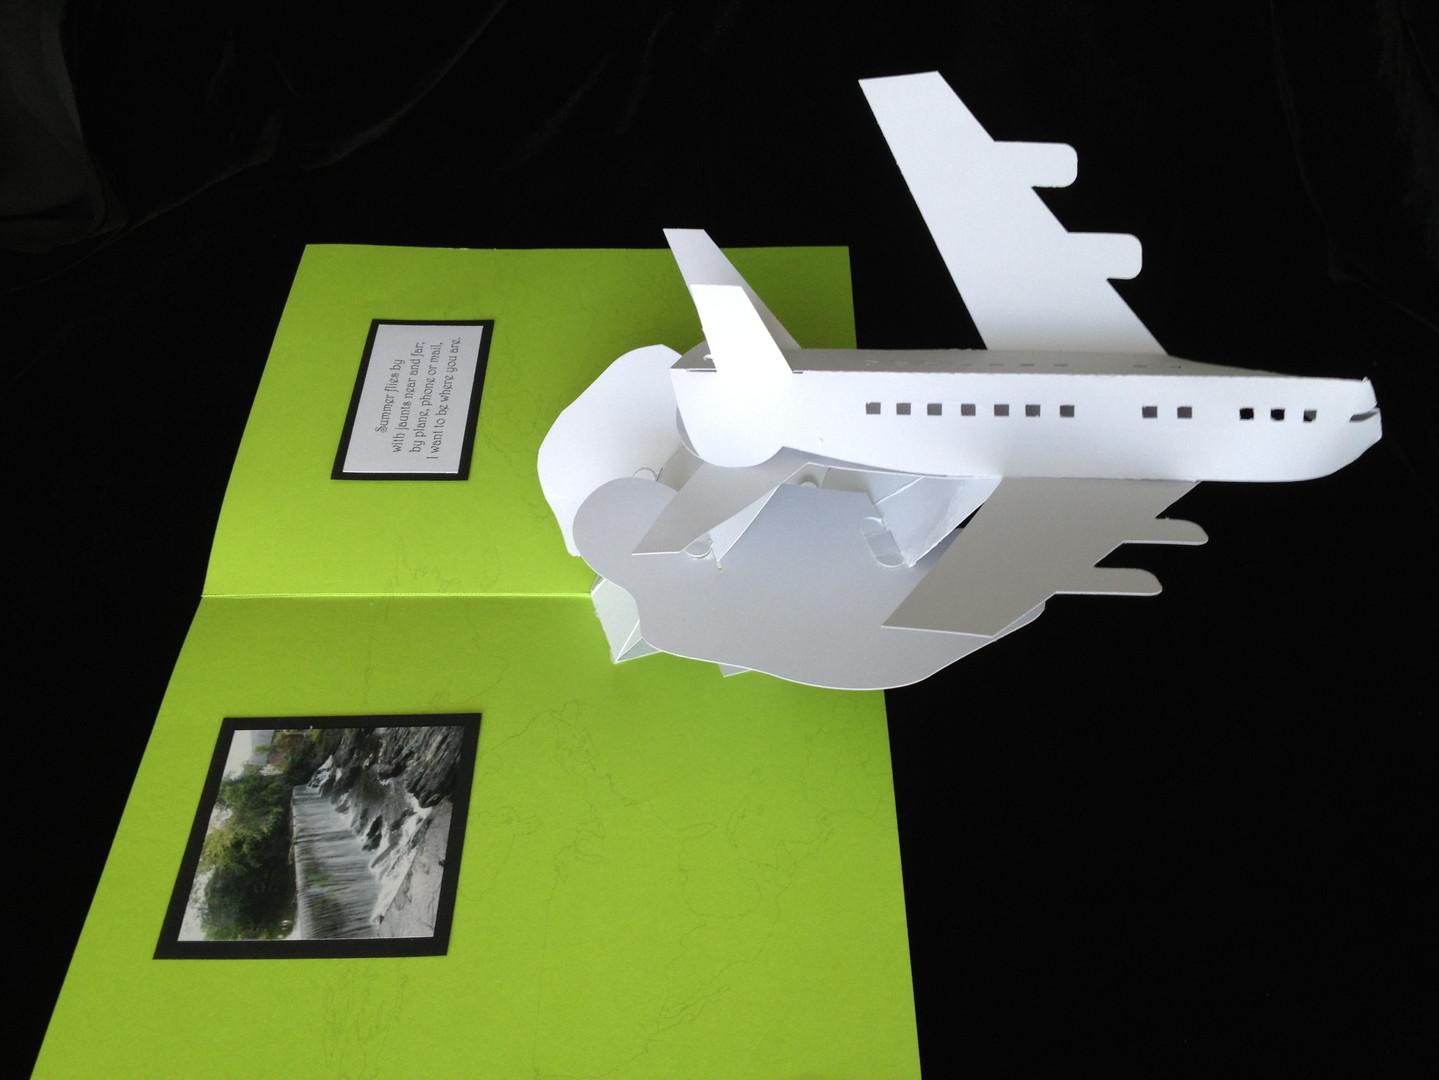 design and engineering by Becca Zerkin